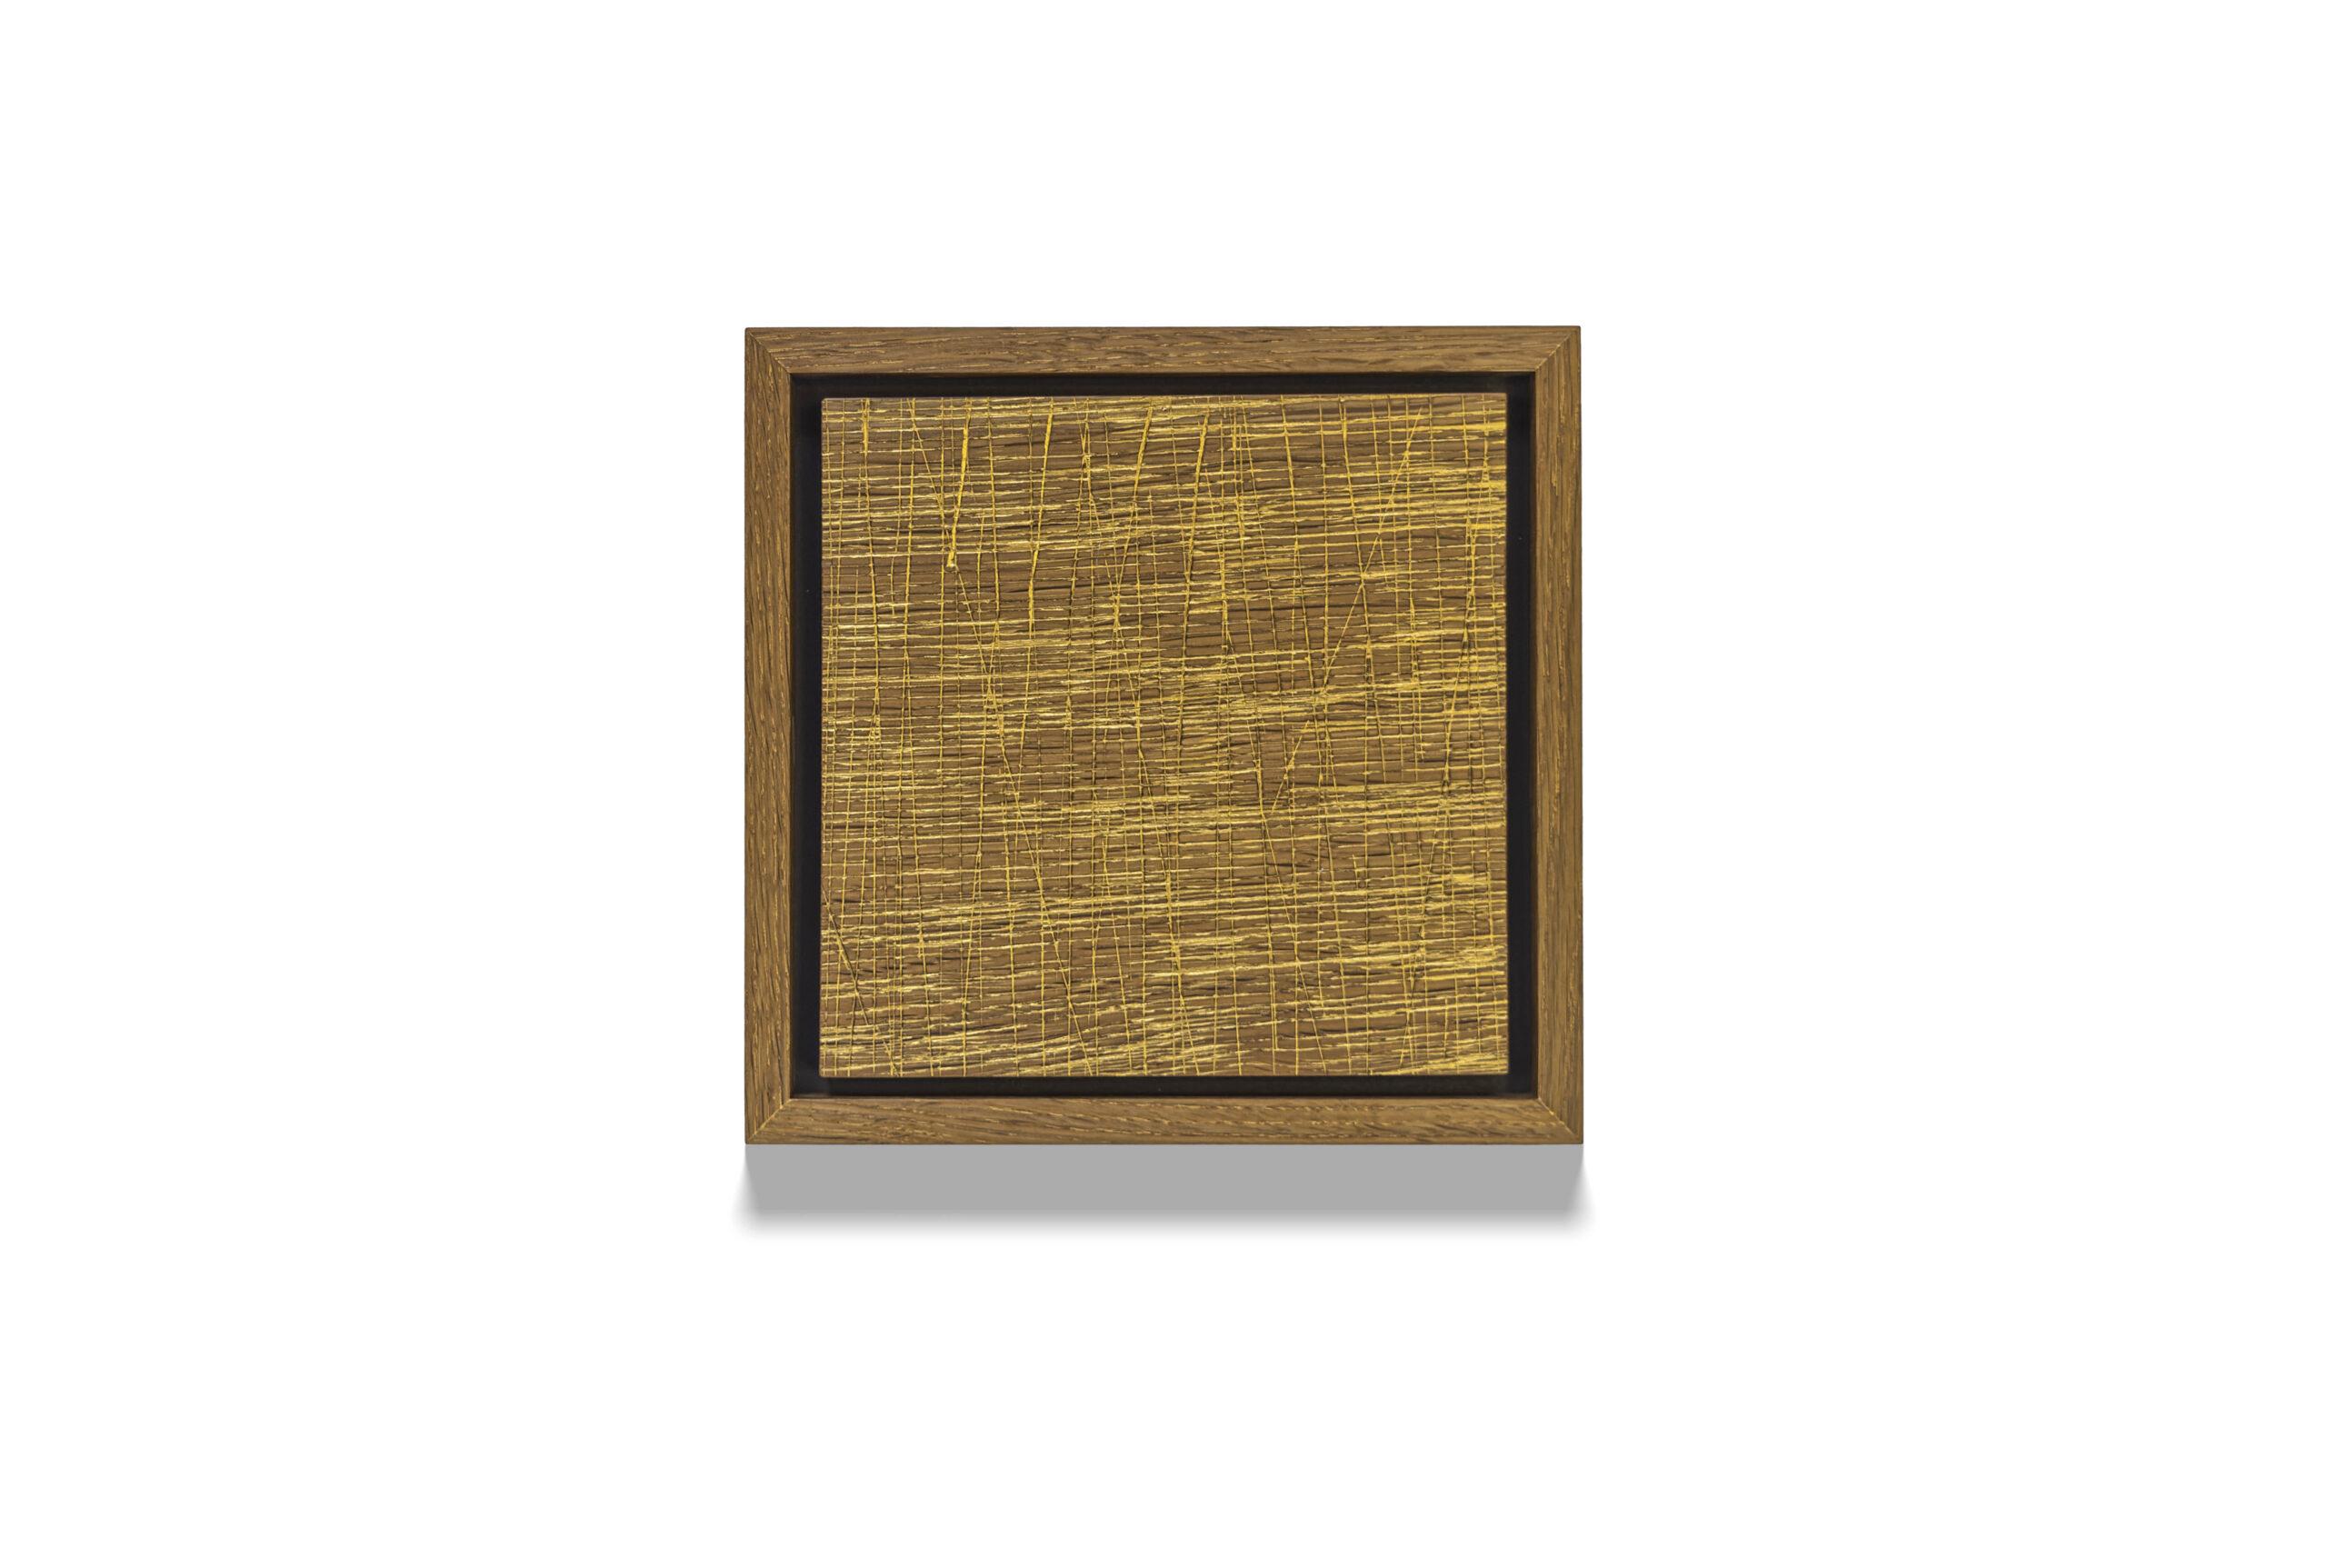 Textured Gold Oak #2 wood drawing